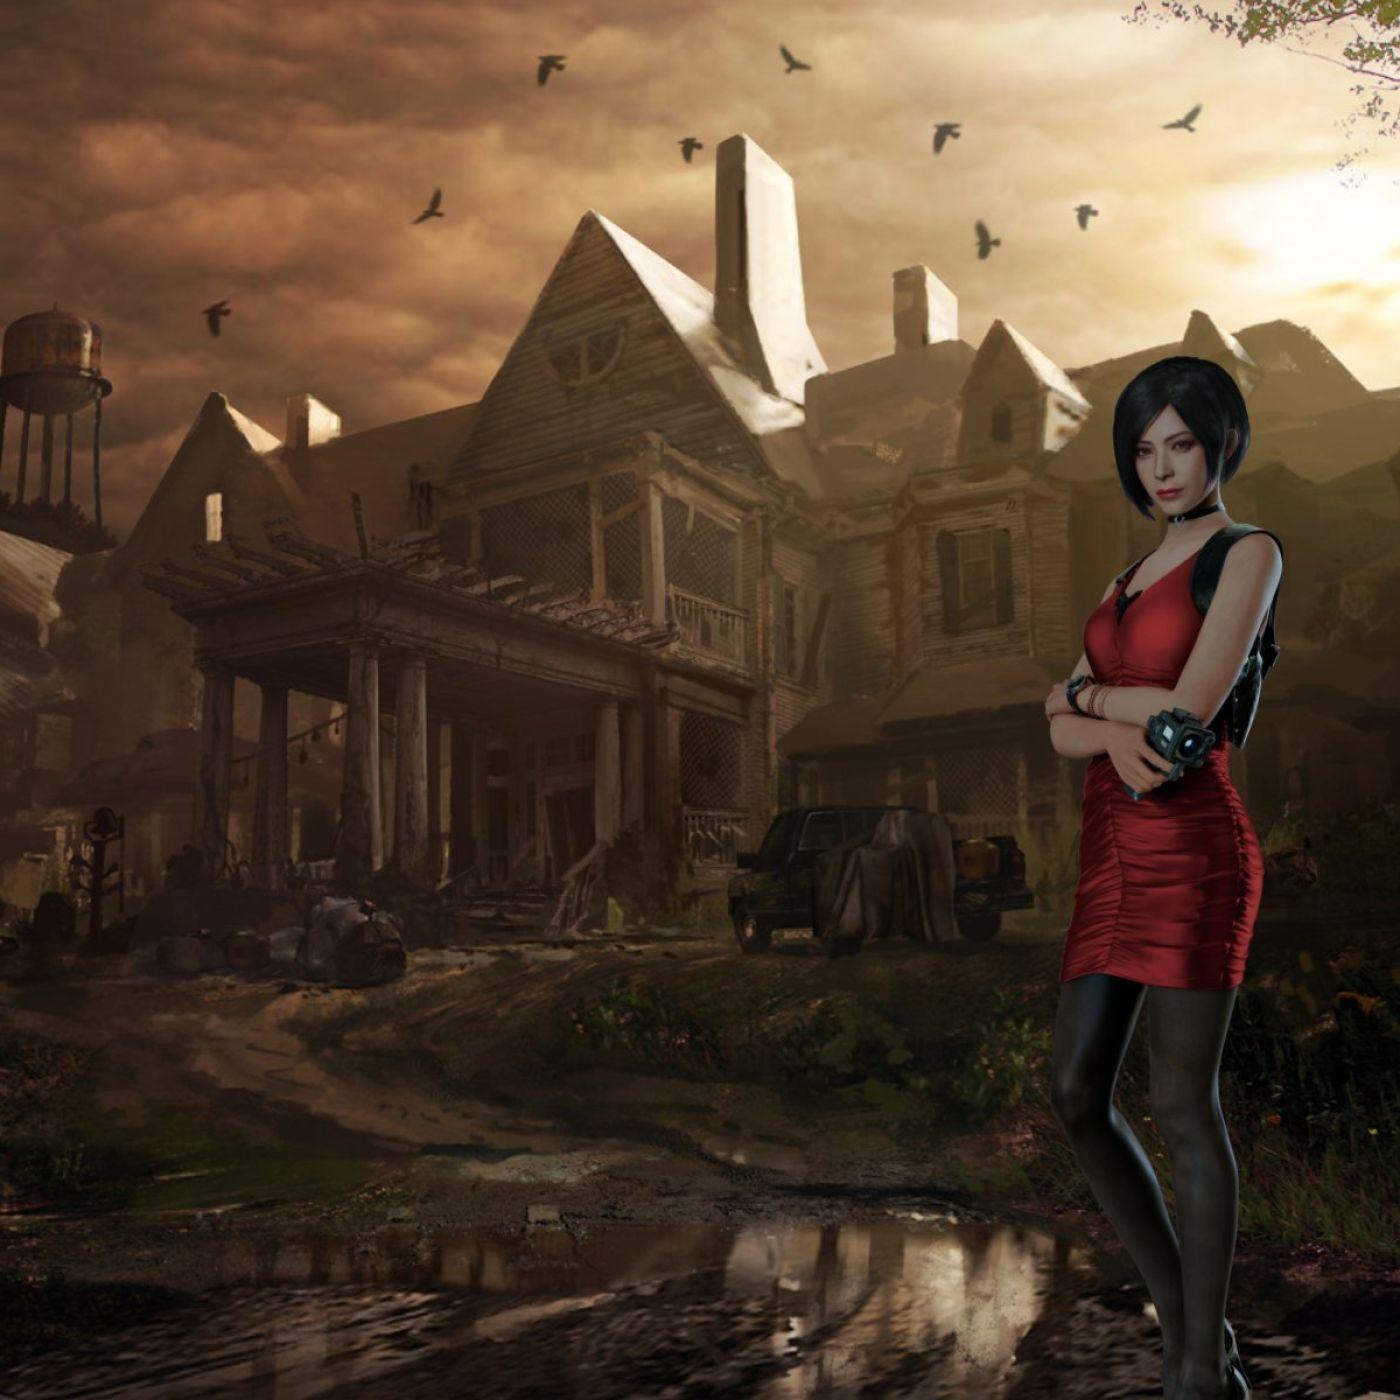 Papa, à quoi tu joues ? - 69 - Resident Evil 7 / Resident Evil 2 Remake